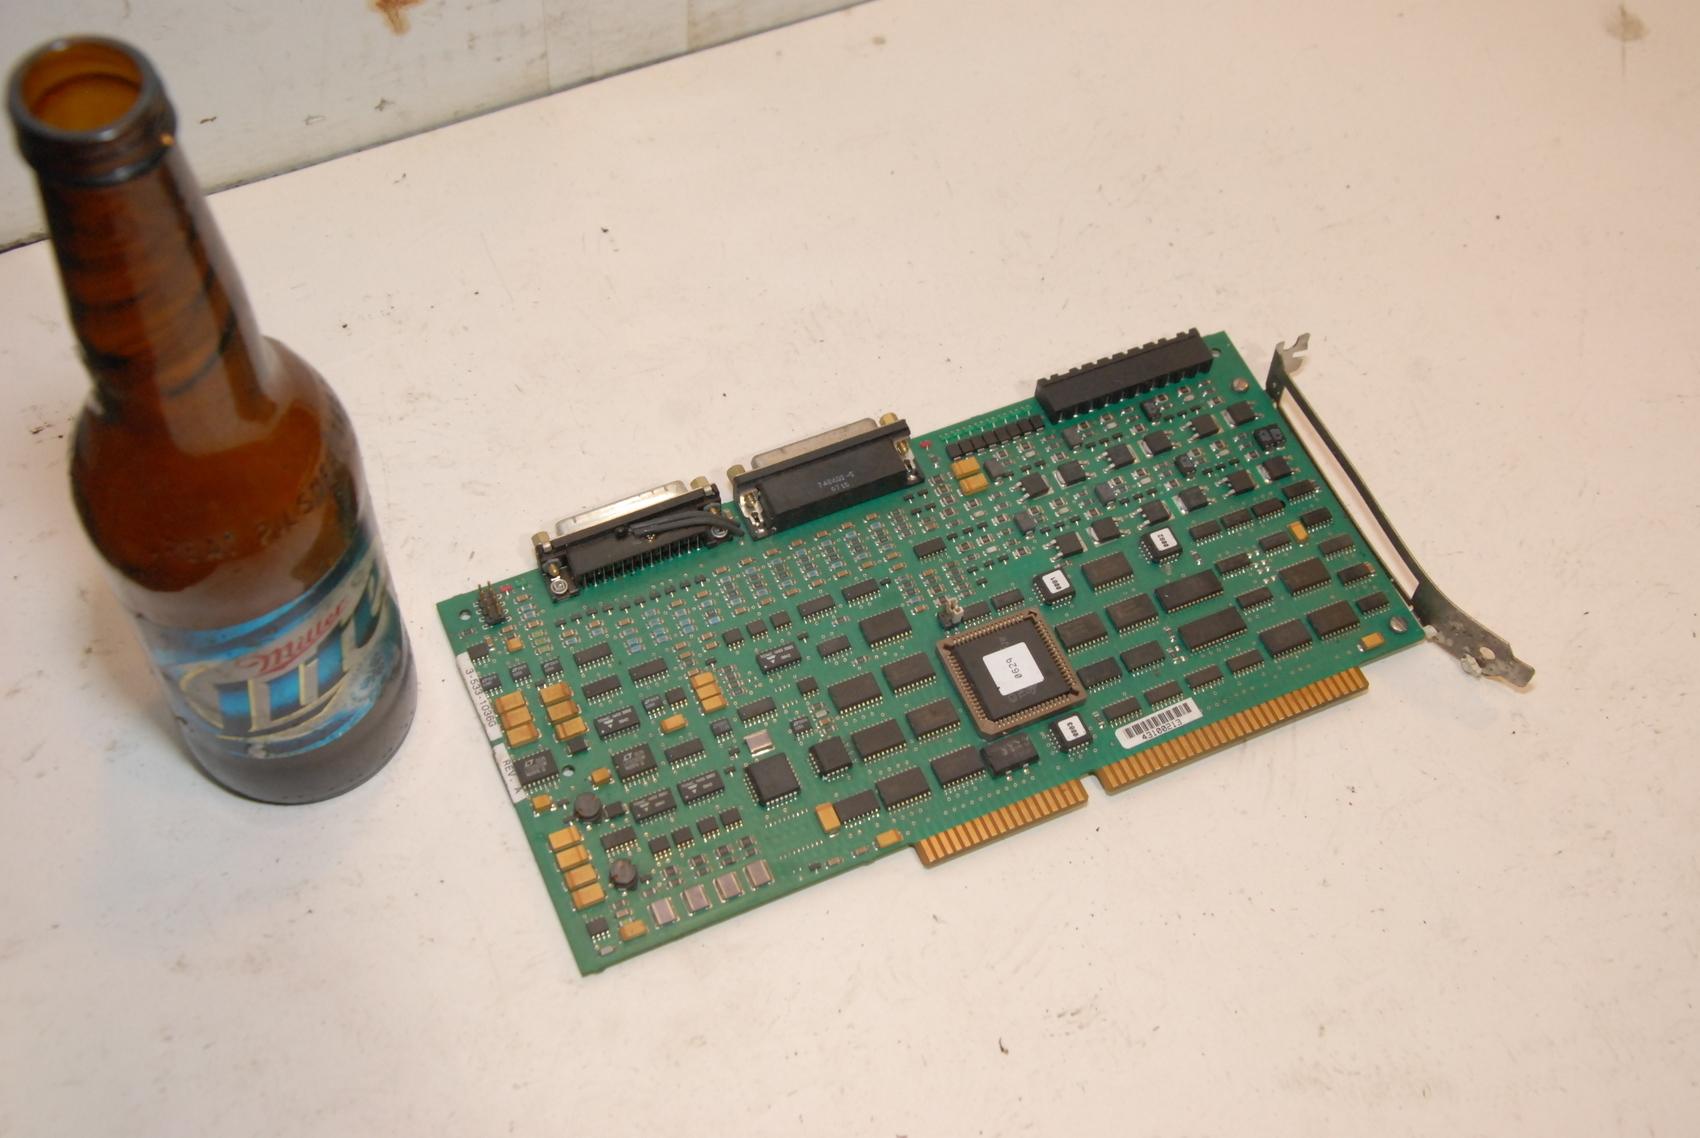 Cincinnati Milacron 3-533-1036G Digital Signal Processor Board Rev A